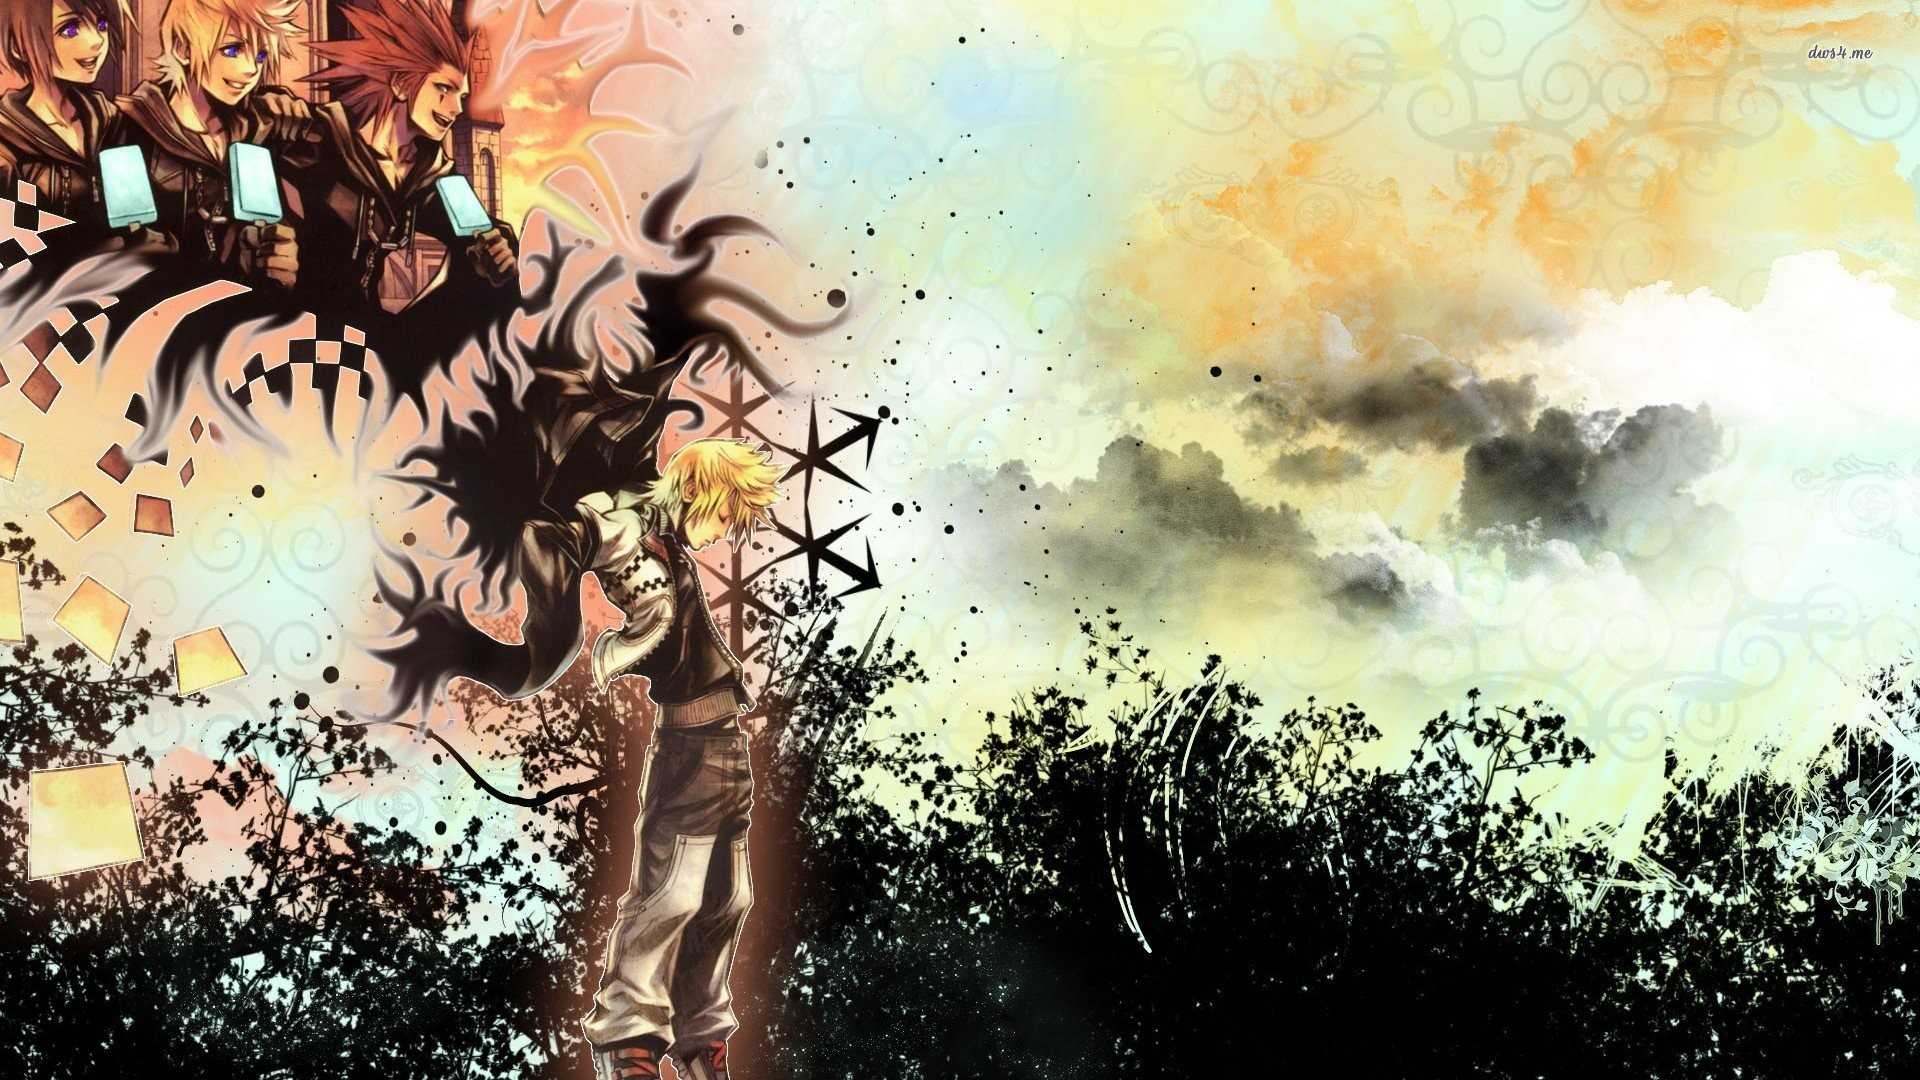 Kingdom Hearts 3582 Days Wallpaper ·① WallpaperTag